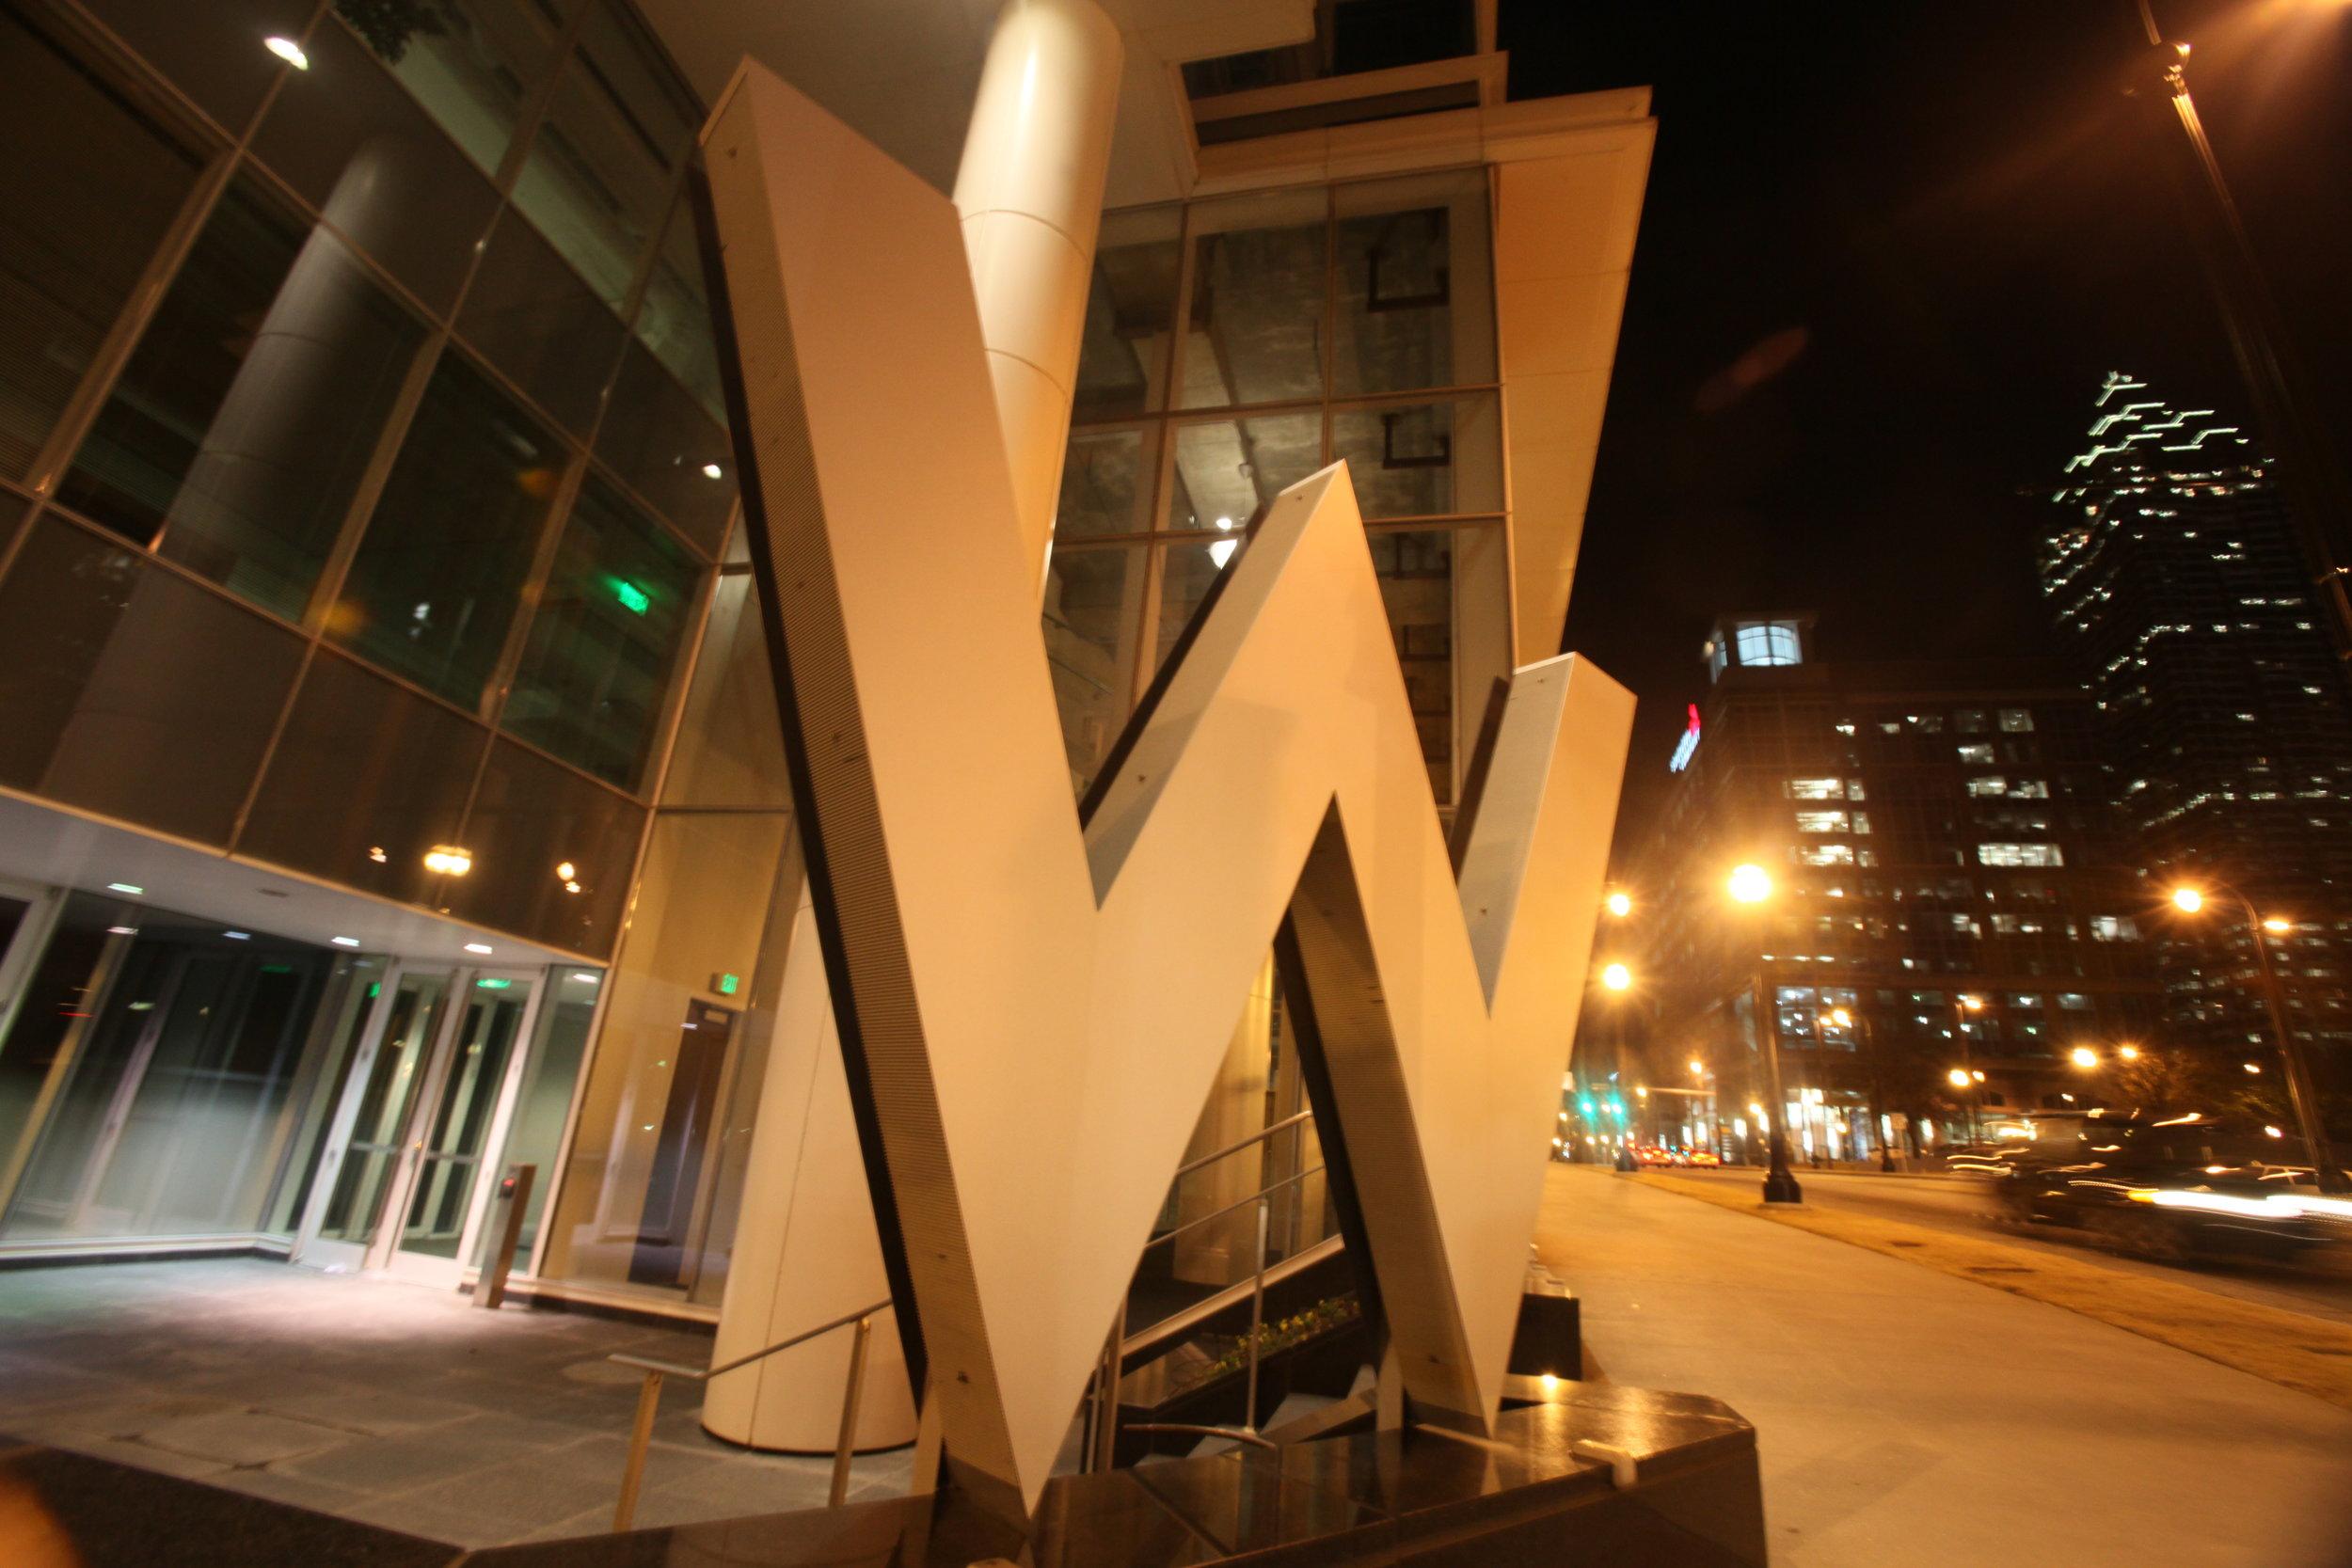 059-W-Atlanta-Hospitality-03042010.JPG